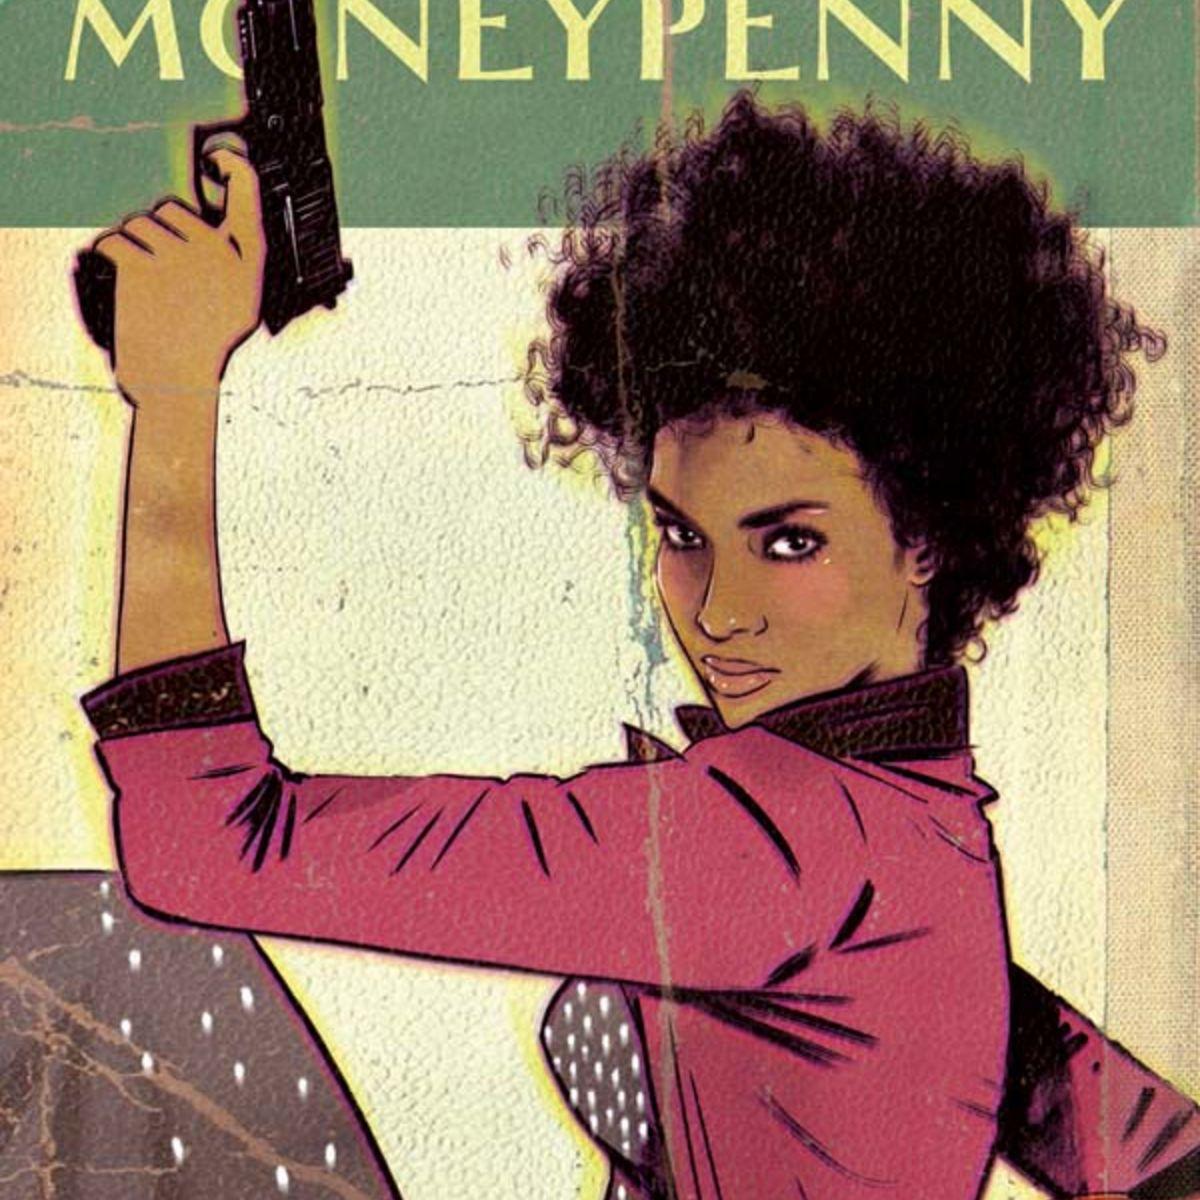 Moneypenny.jpg